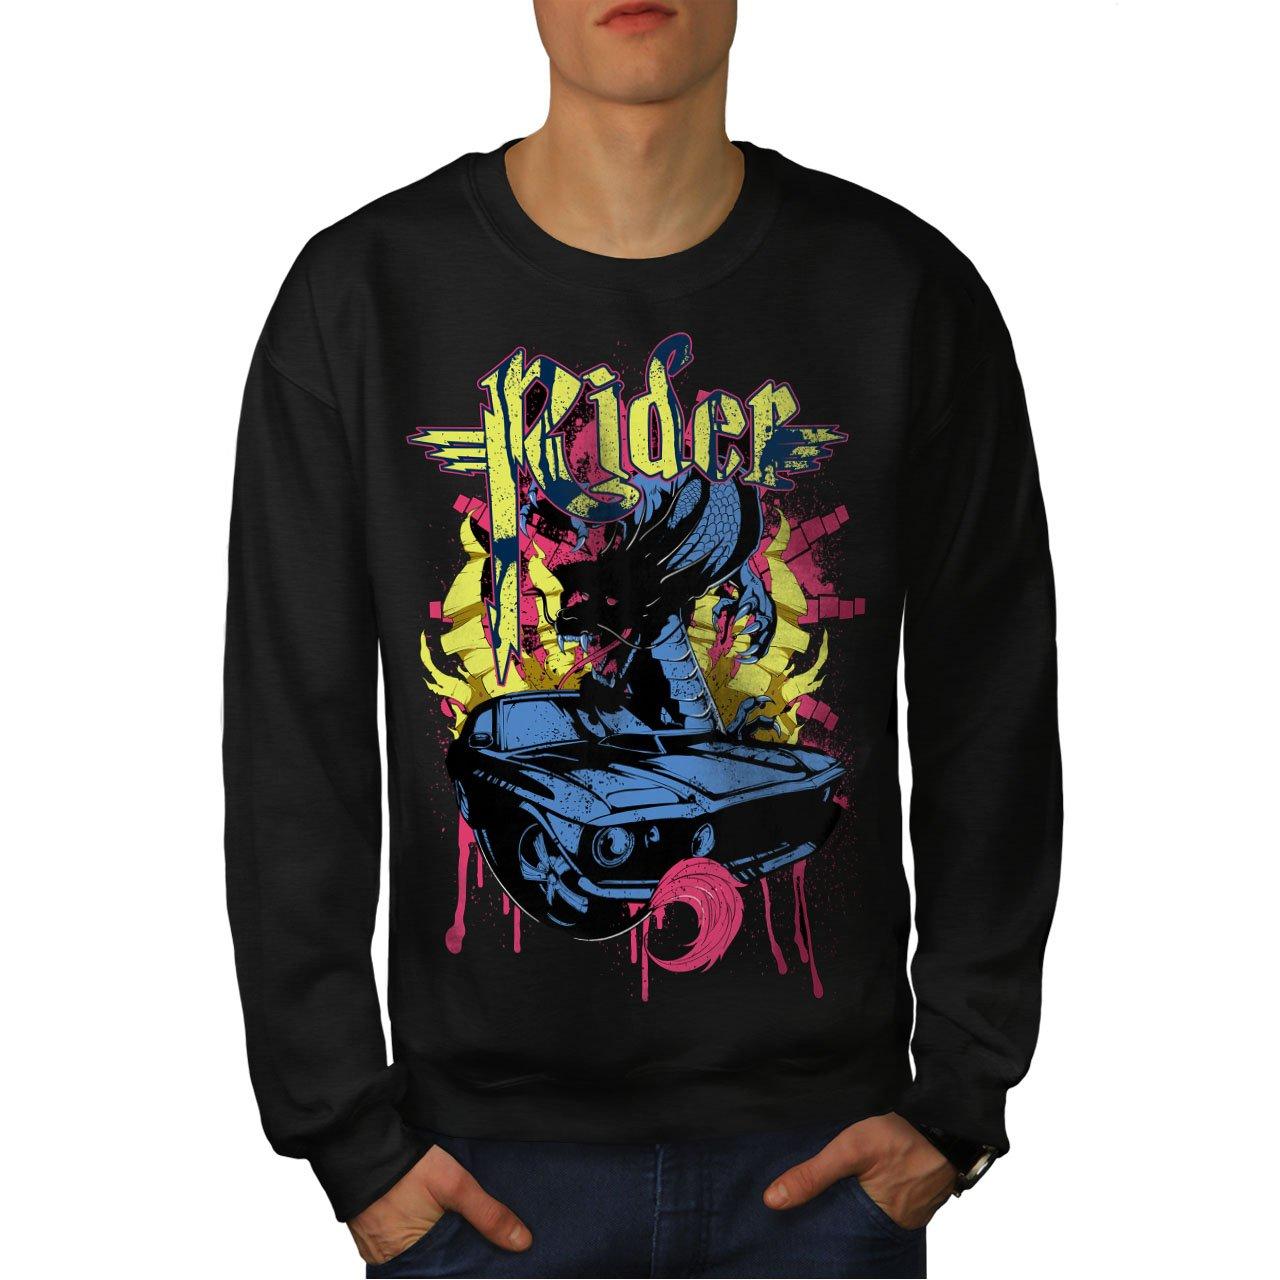 Automobile Casual Jumper wellcoda Rider Blood Sport Mens Sweatshirt